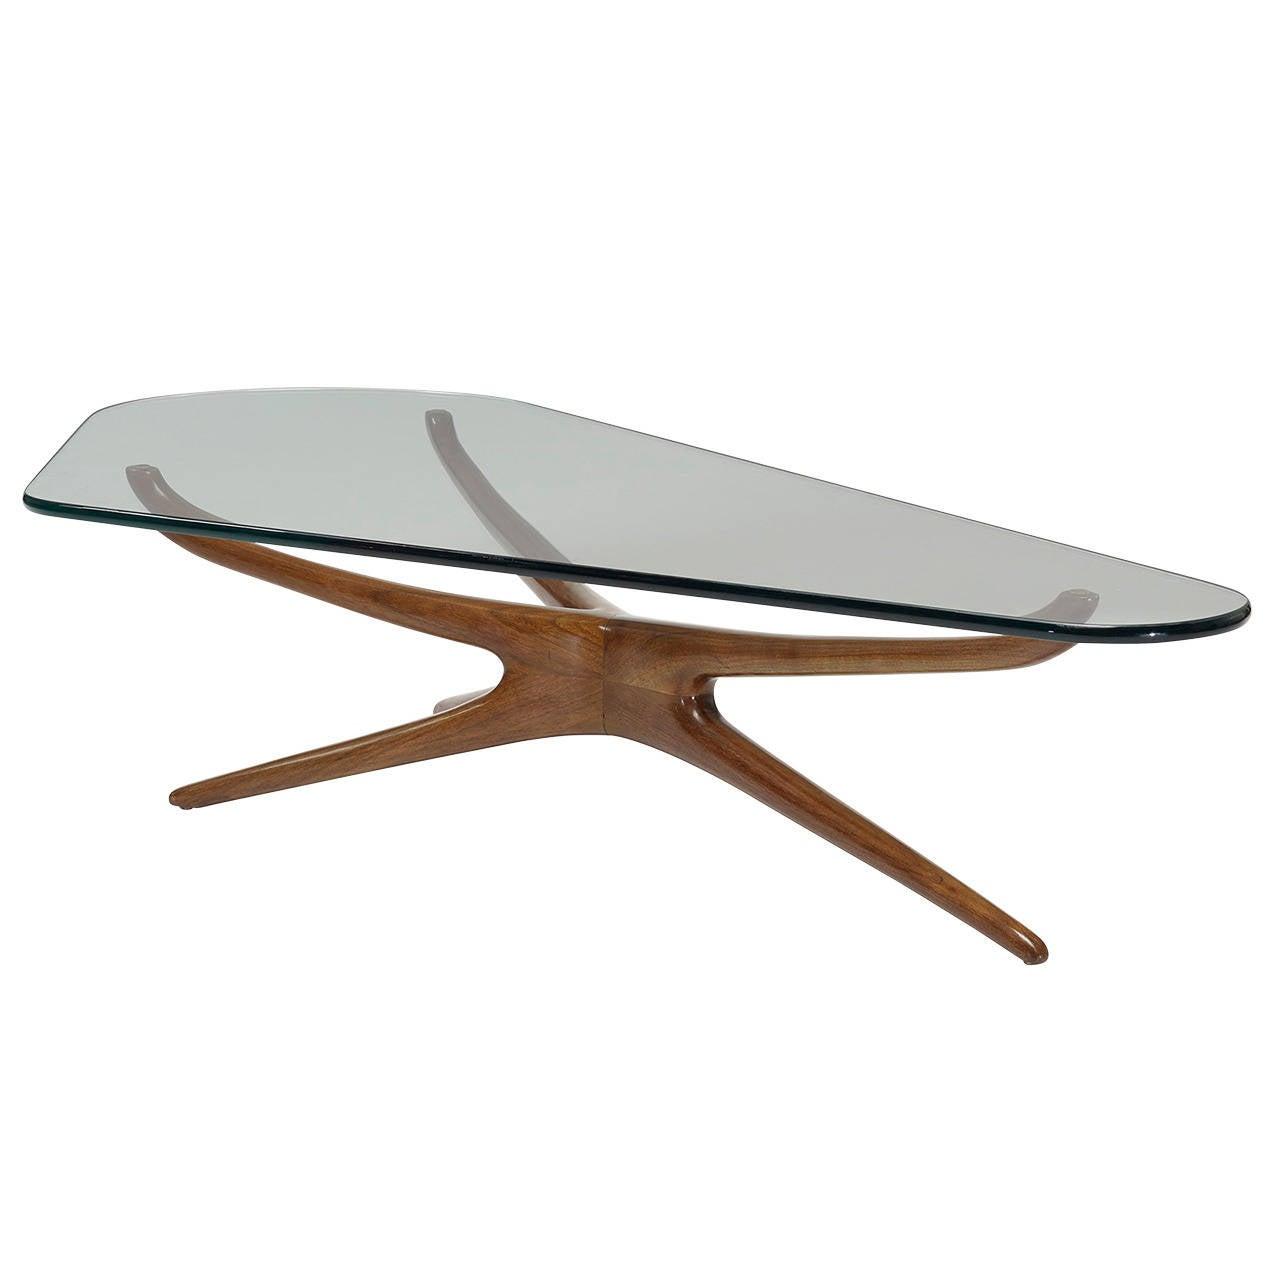 Tri Symmetric Coffee Table Vladimir Kagan For Vladimir Kagan throughout size 1280 X 1280